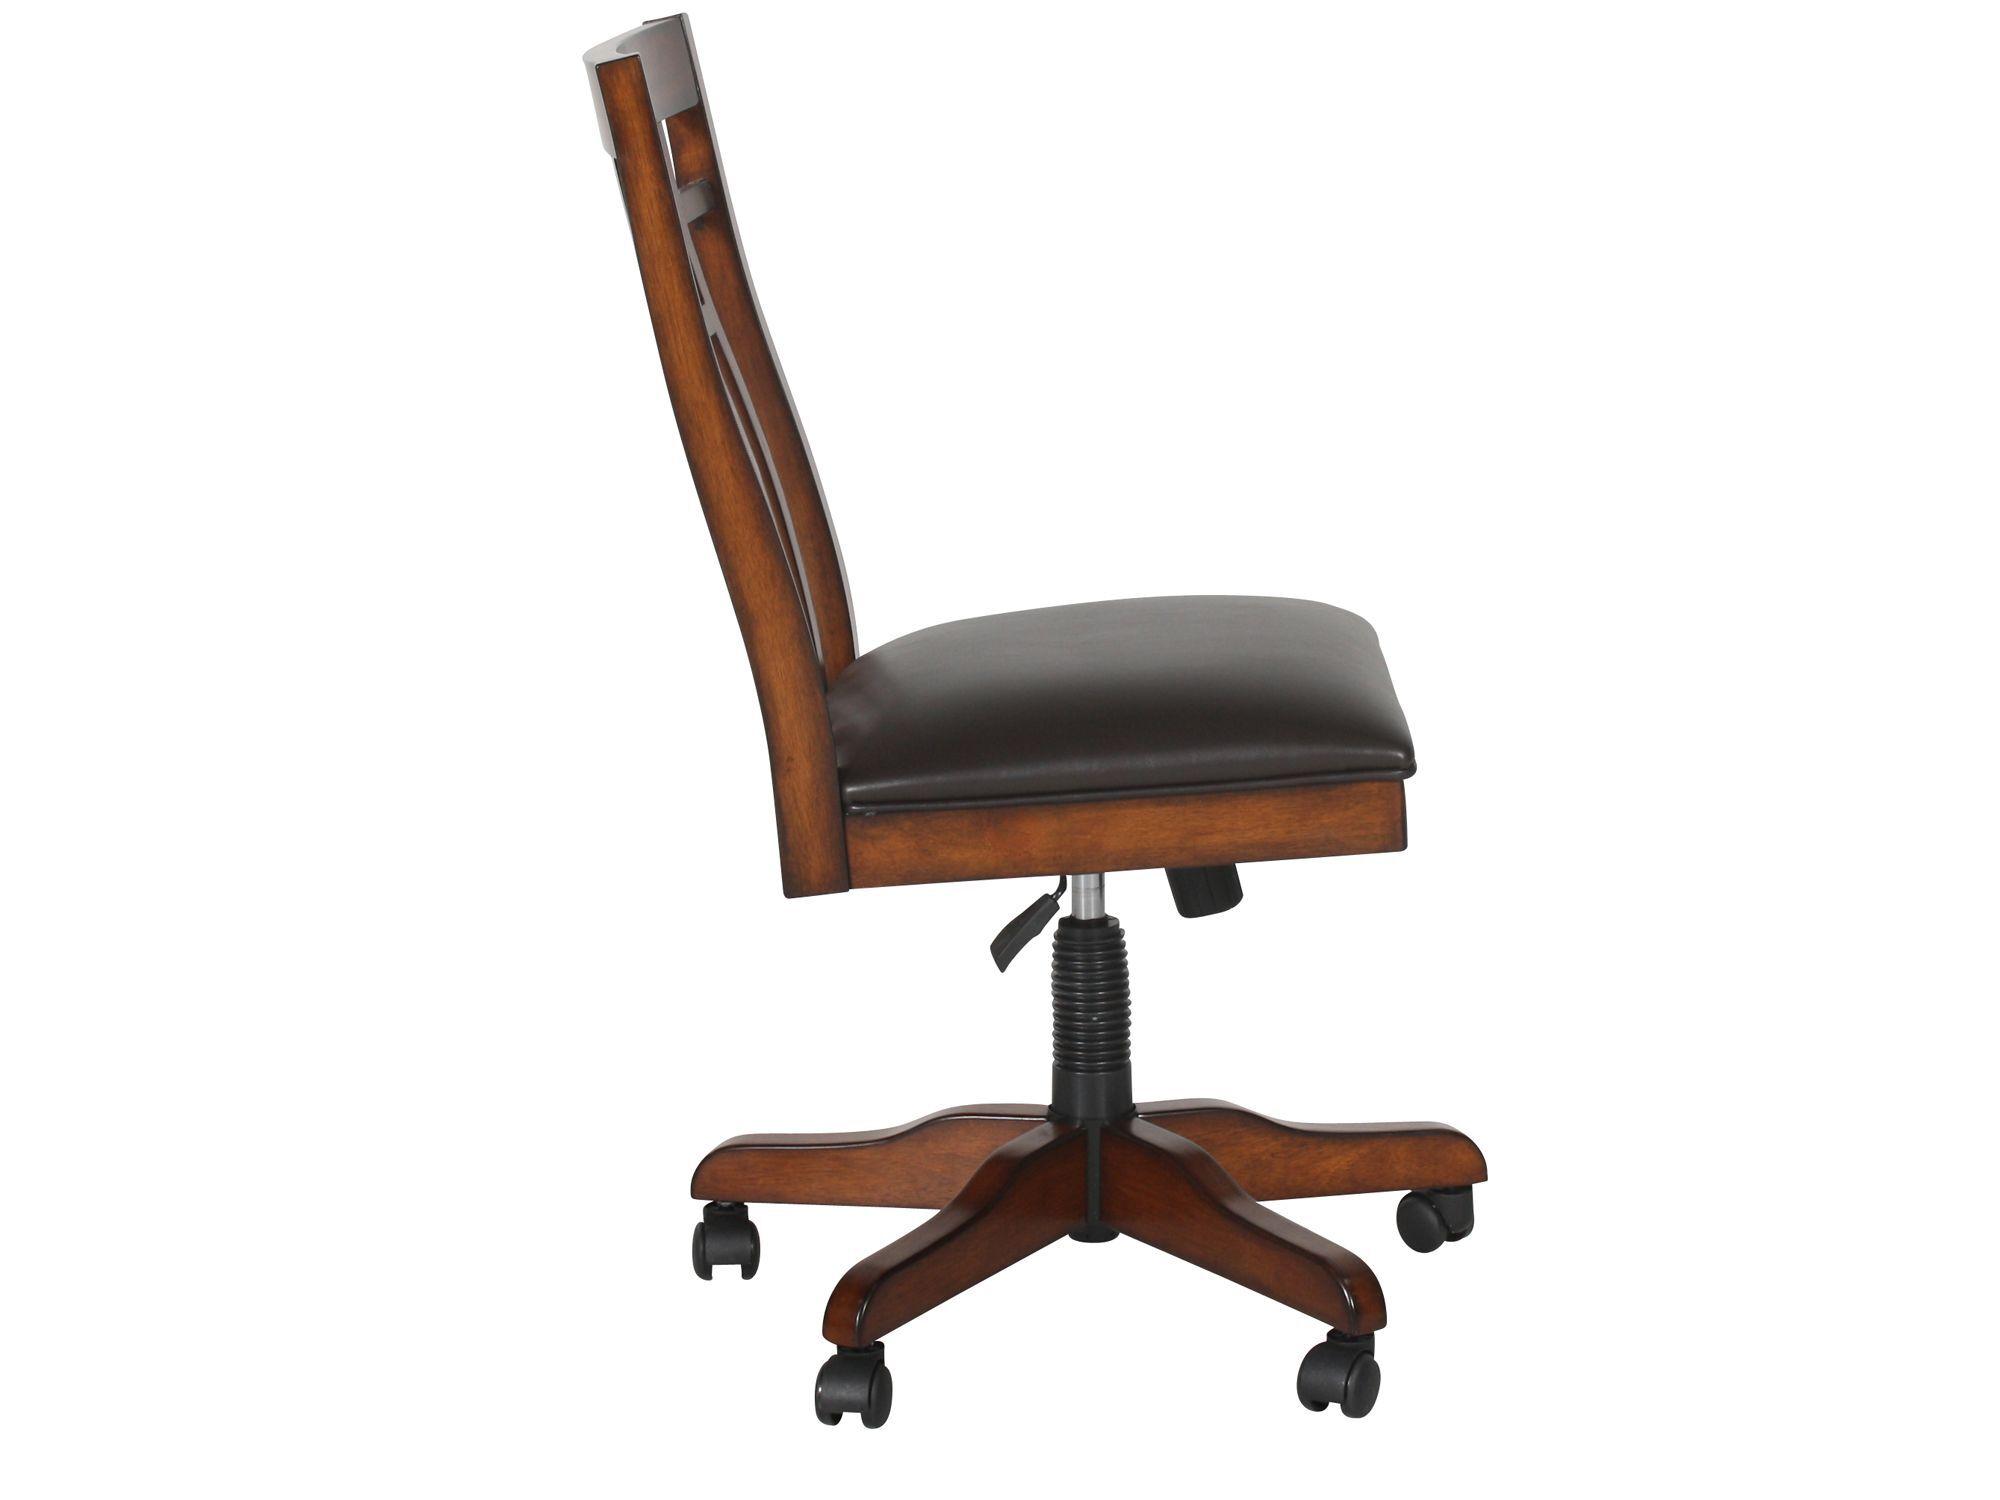 zahara swivel chair bed twin sleeper spladder back tilt office in medium oak